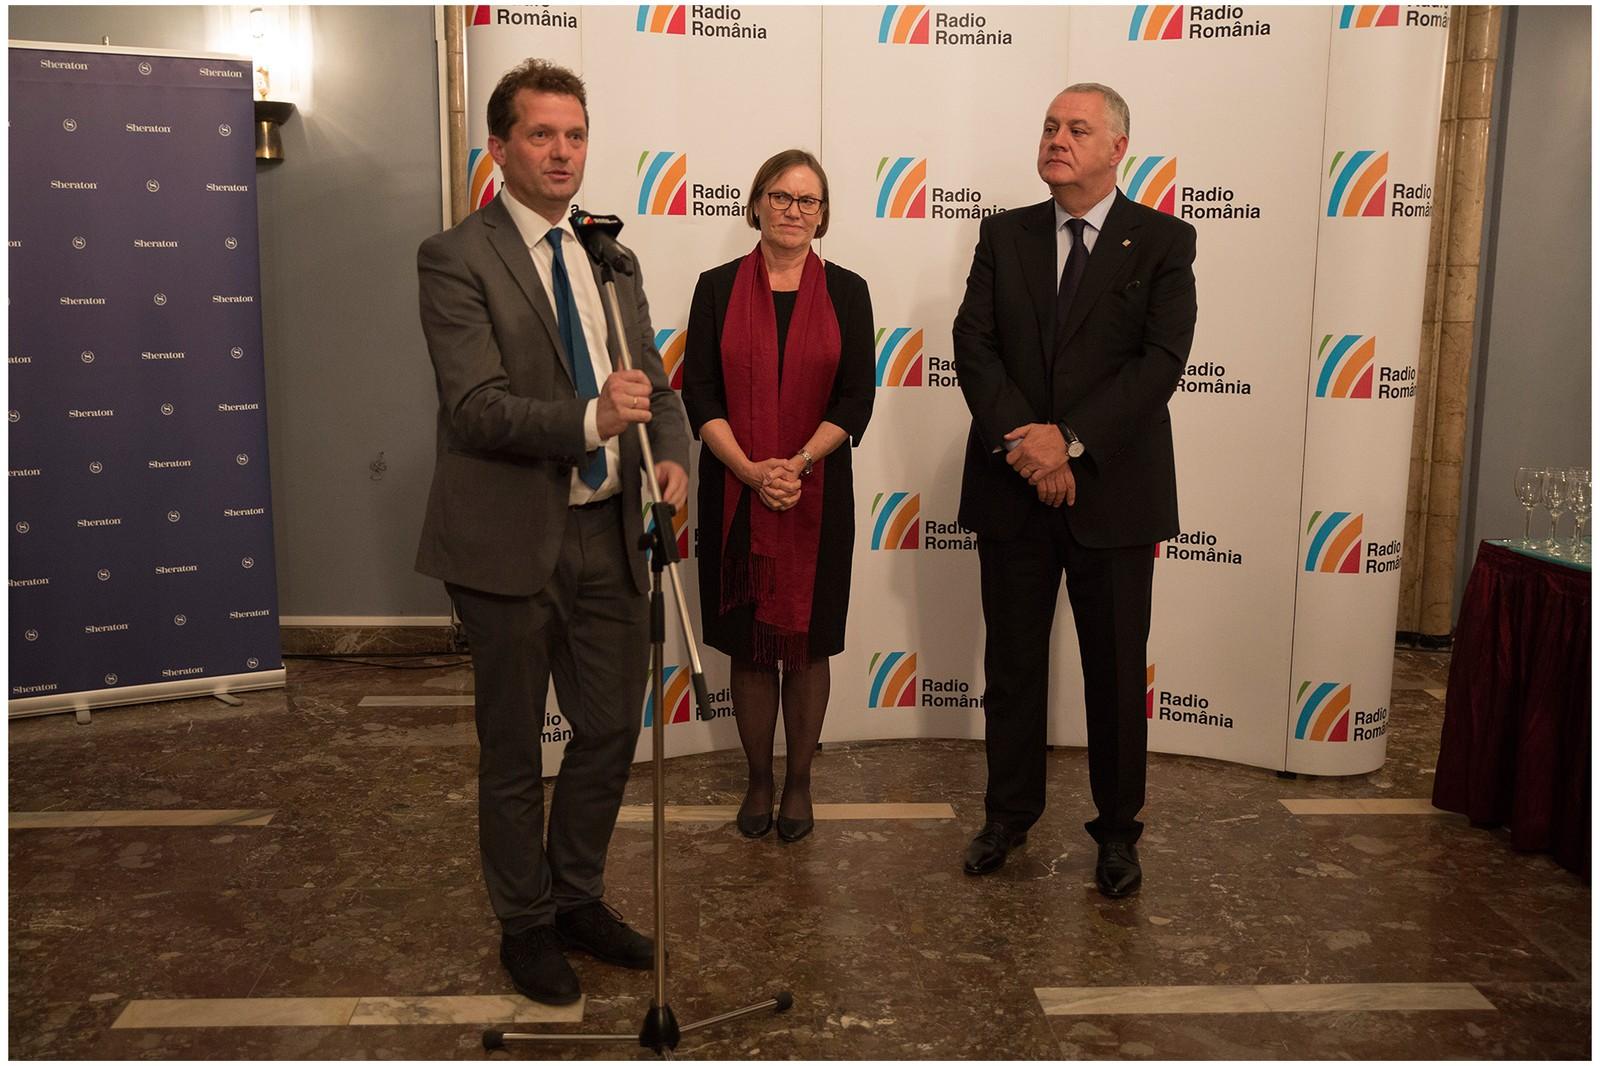 Fra venstre: Orkestersjef i KORK, Rolf Lennart Stensø, Ambassadør til Romania, Tove Bruvik Westberg og direktør for Radio Romania, Ovidiu Miculescu